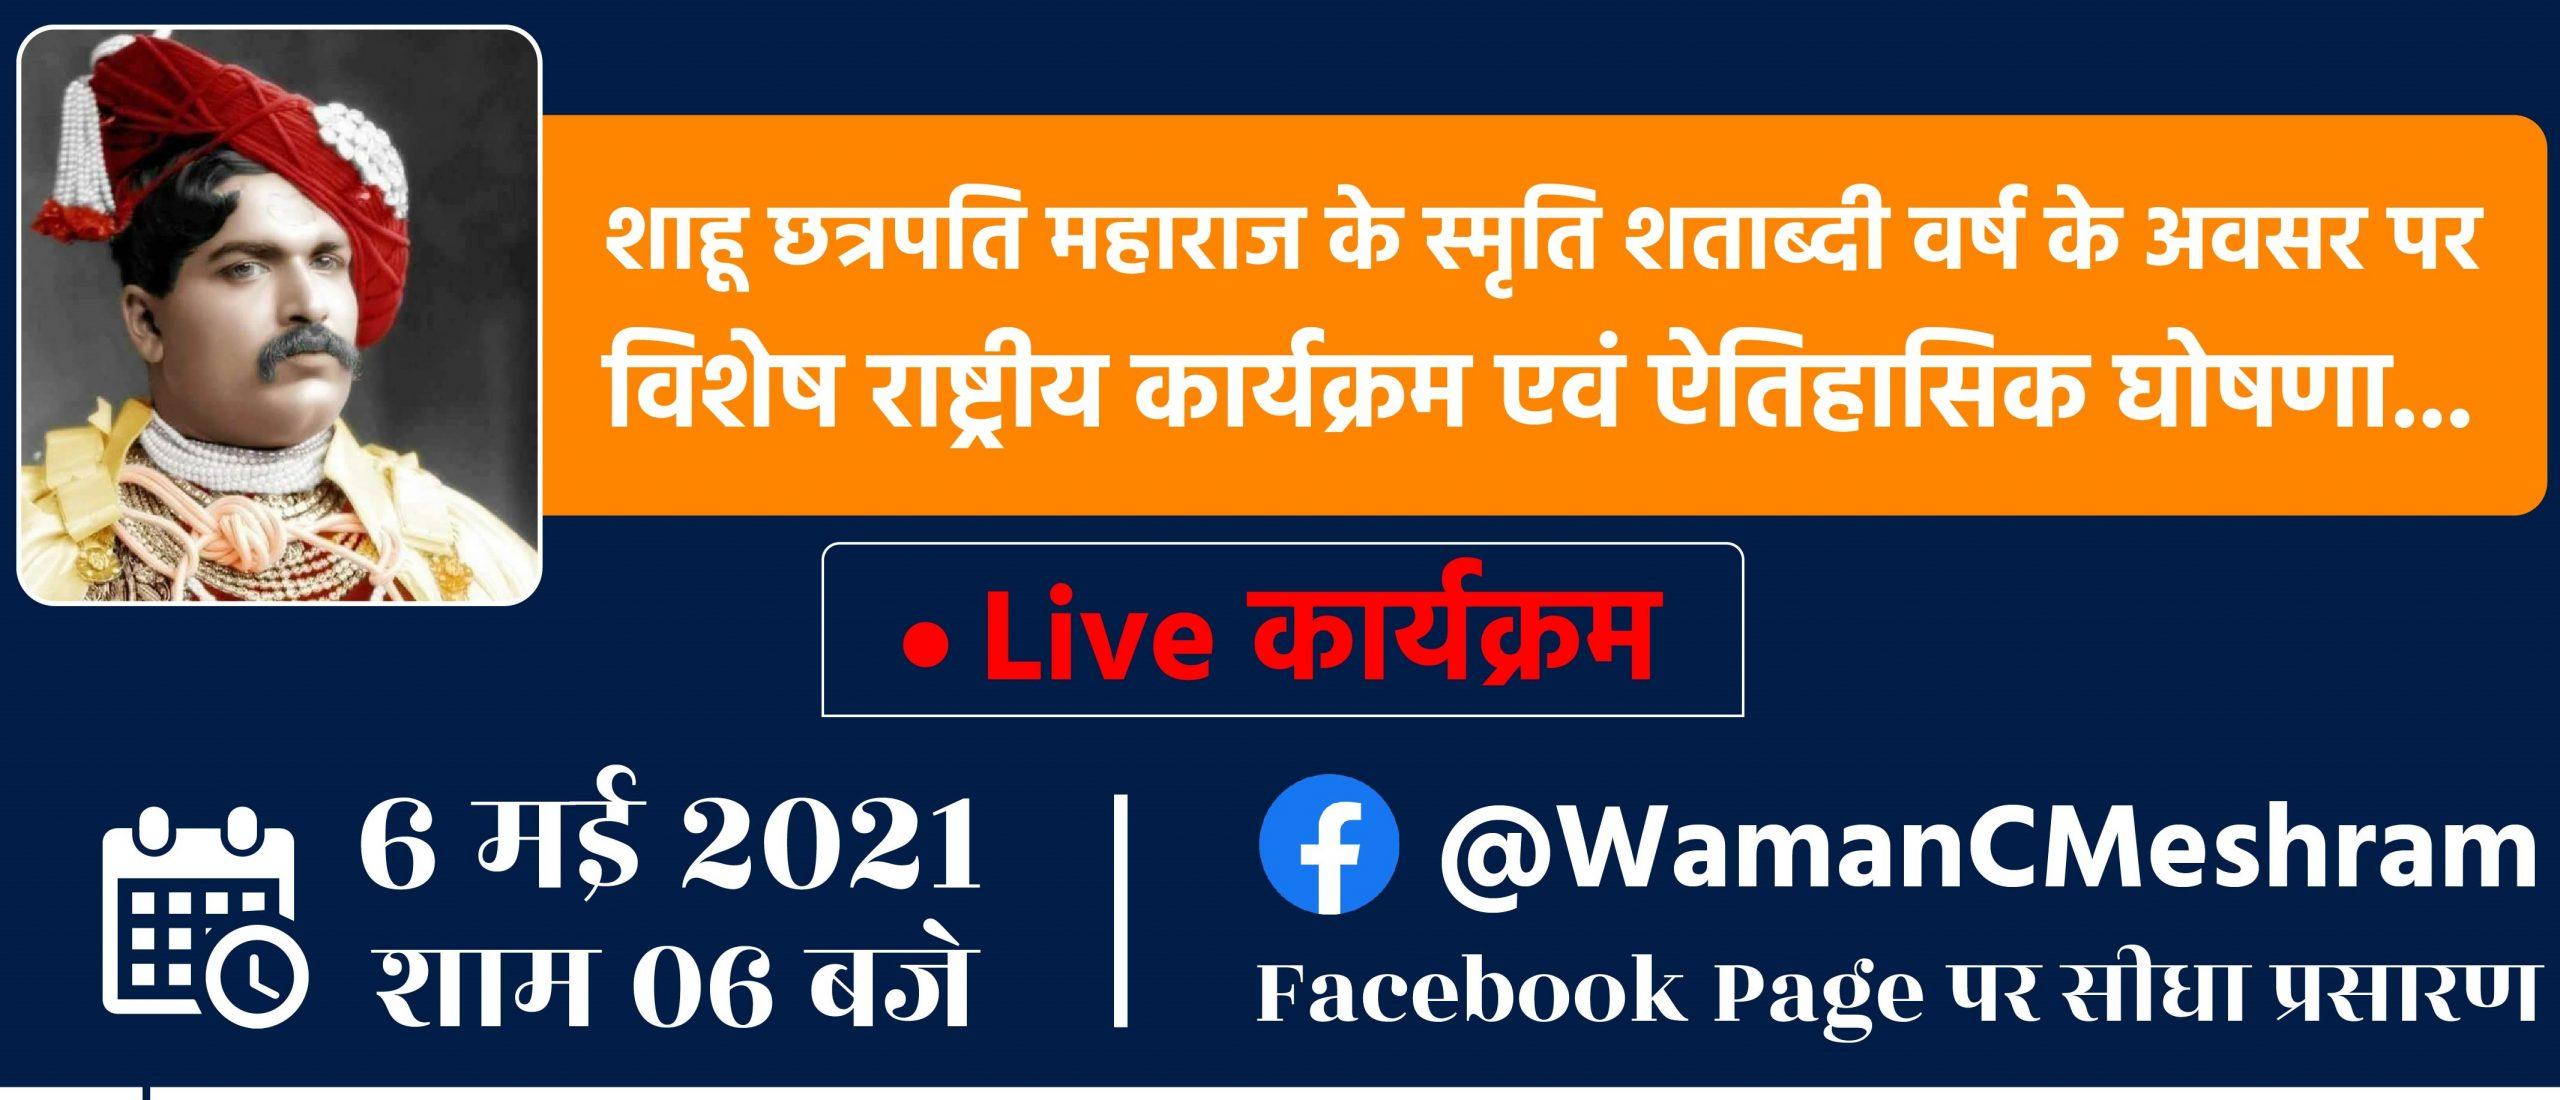 Virtual Program – Chhatrapati Shahu Maharaj Memory centenary year.